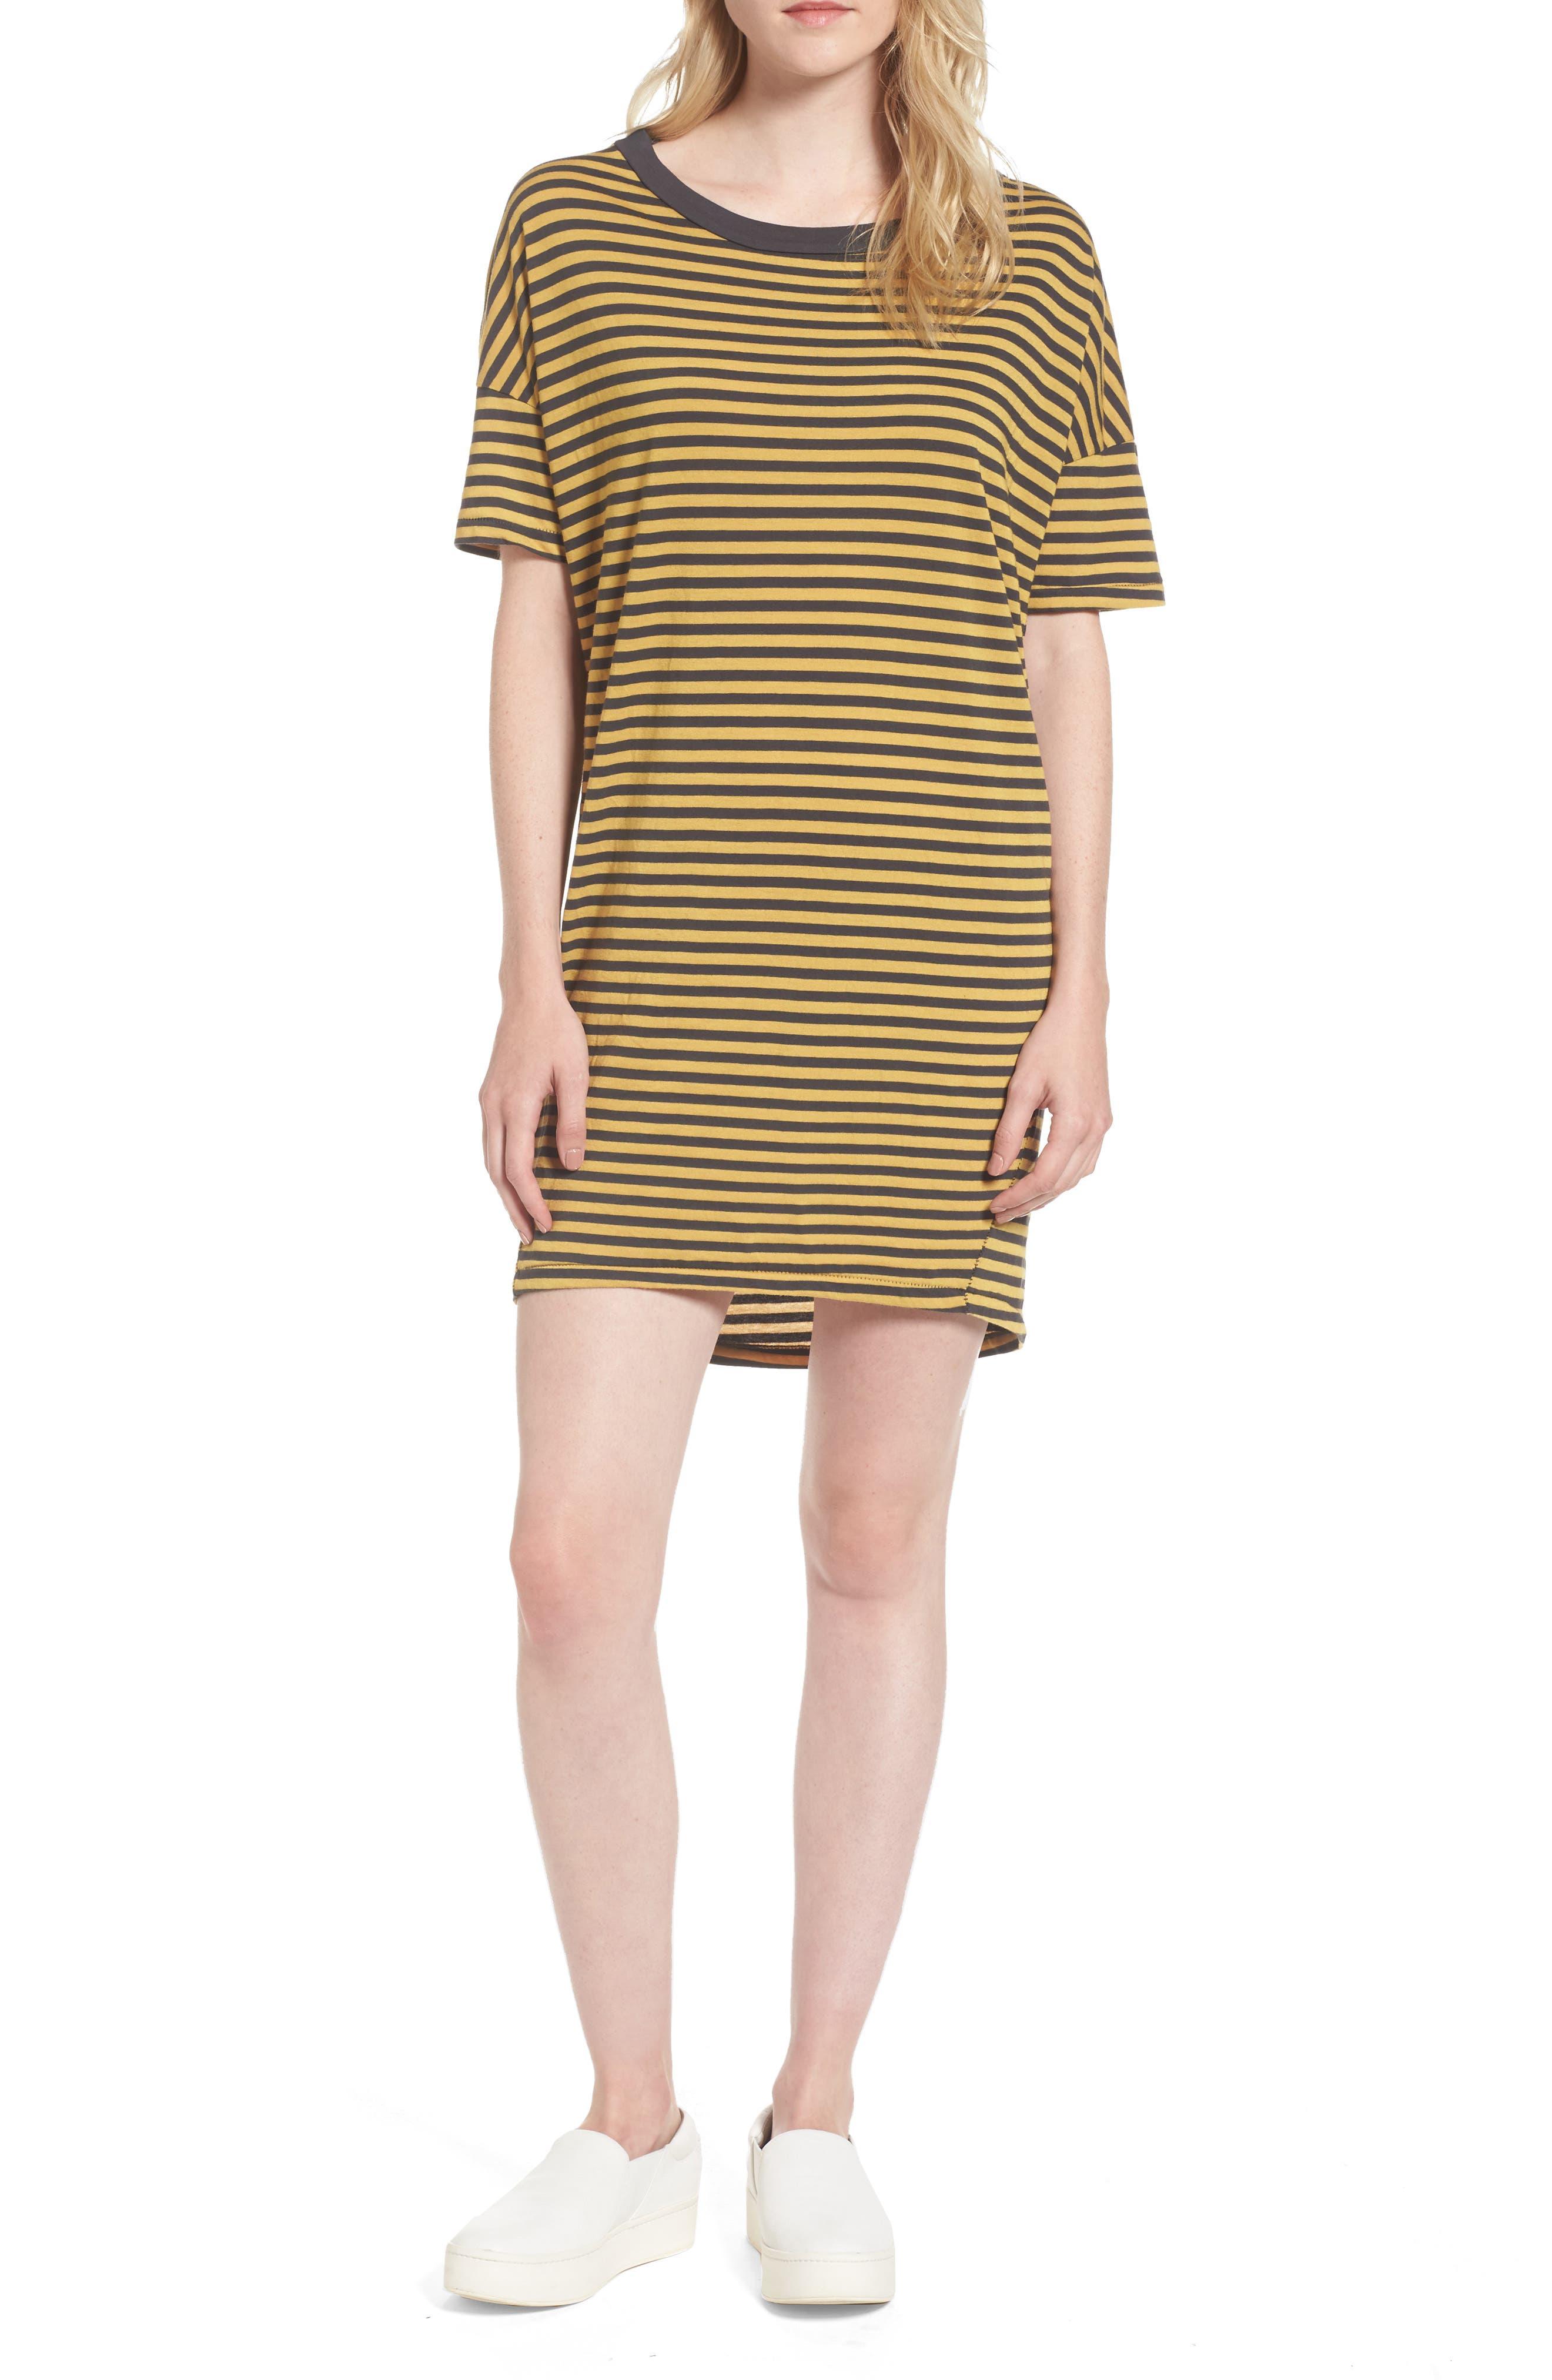 Mustard Stripe T-Shirt Dress,                         Main,                         color, 020